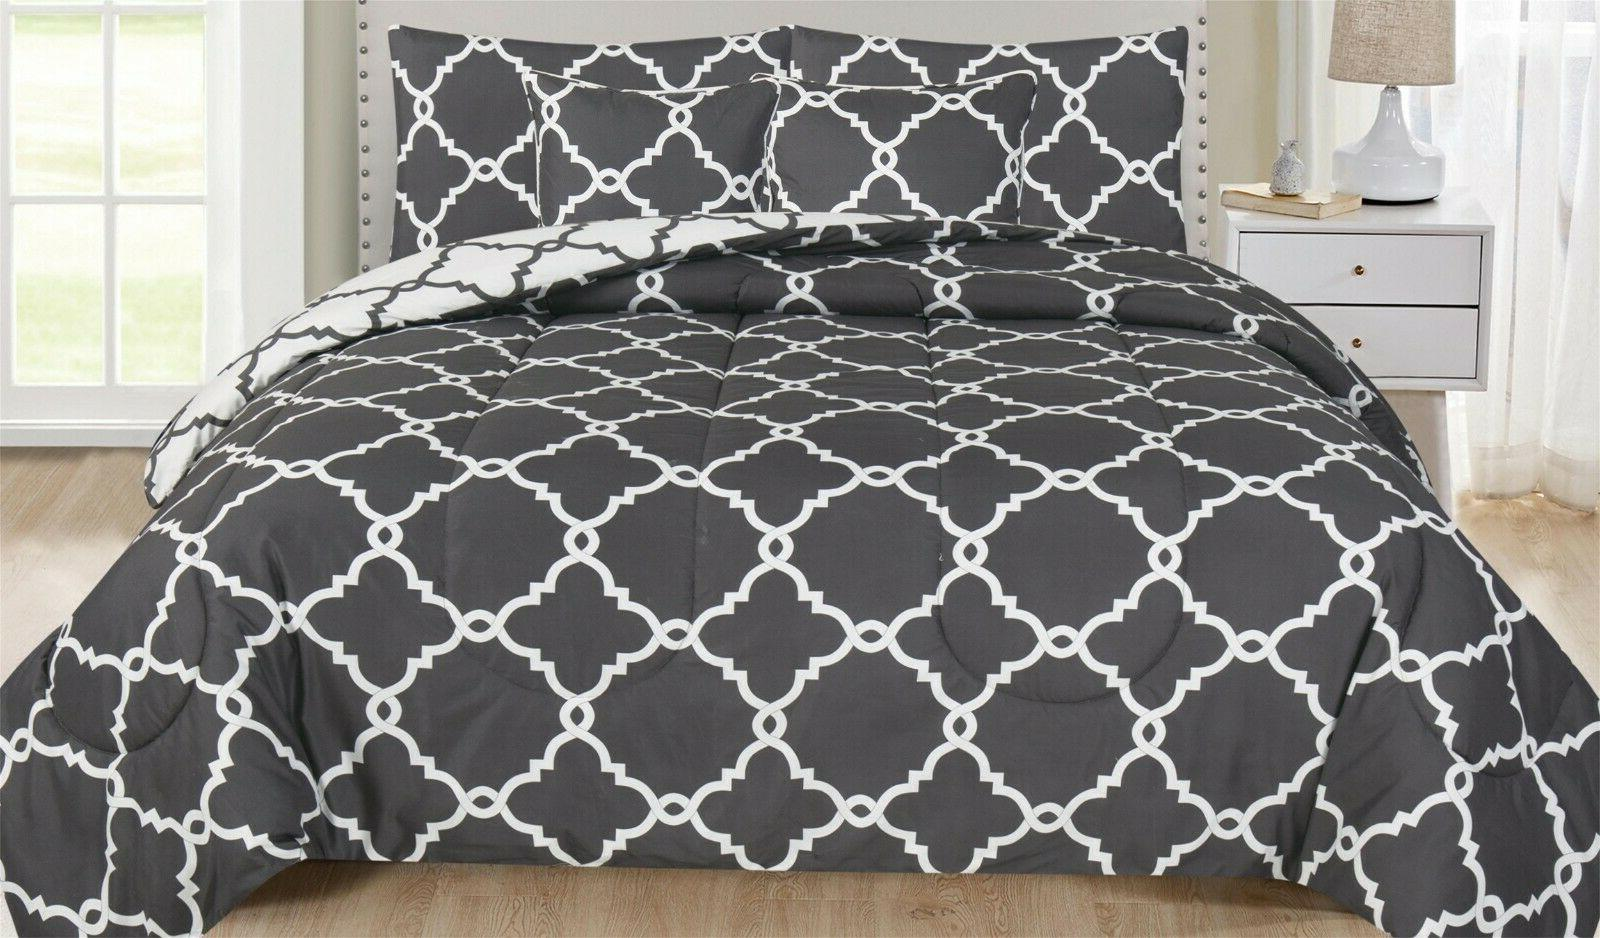 Ultra Soft 5 Piece Reversible Comforter Set Hypoallergenic P